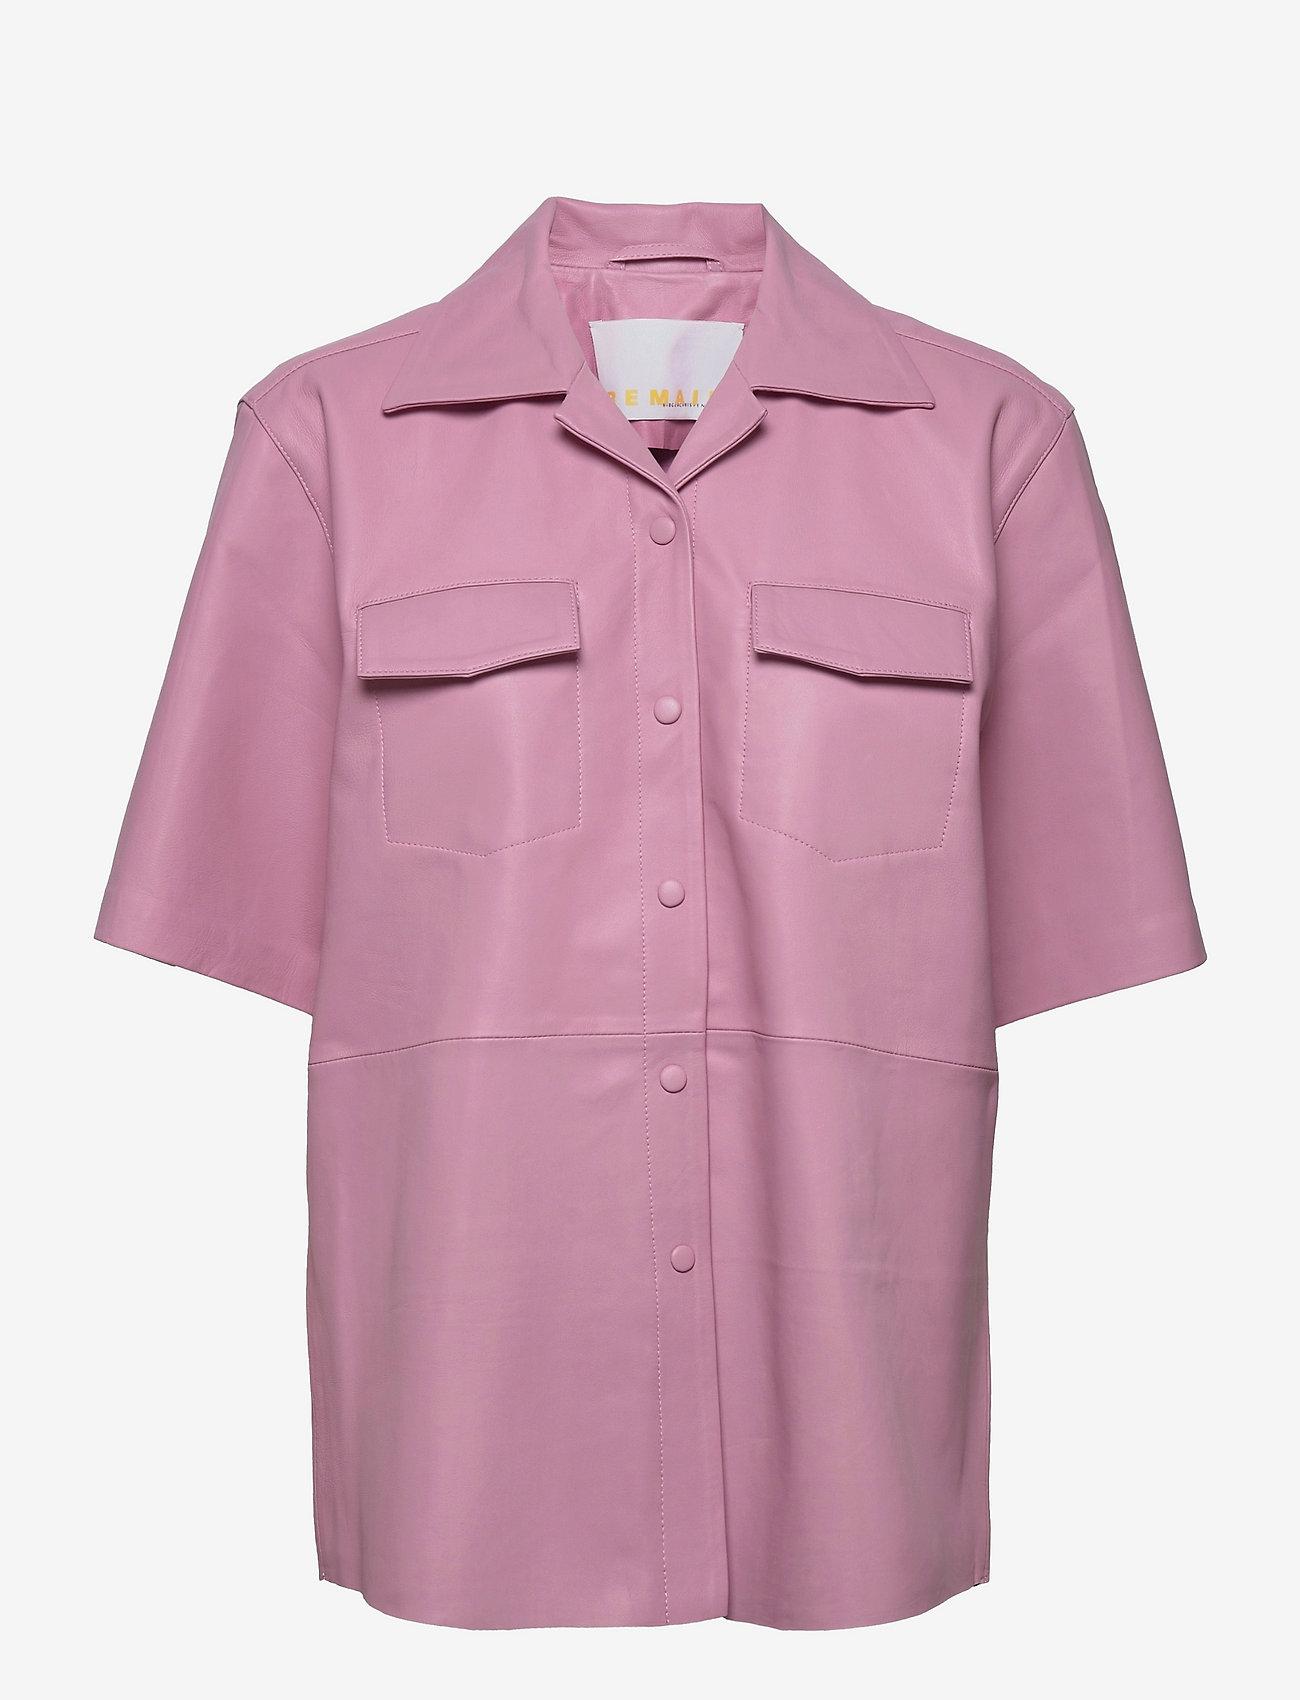 REMAIN Birger Christensen - Jocy Shirt Leather - denimskjorter - pink lavender - 0